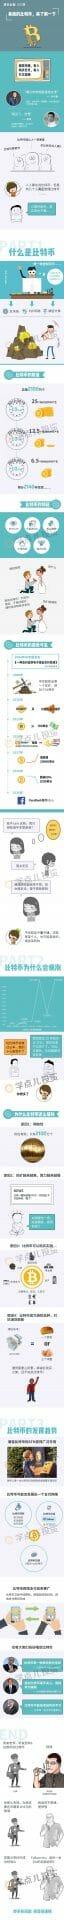 Infografis Bitcoin - Bank of China